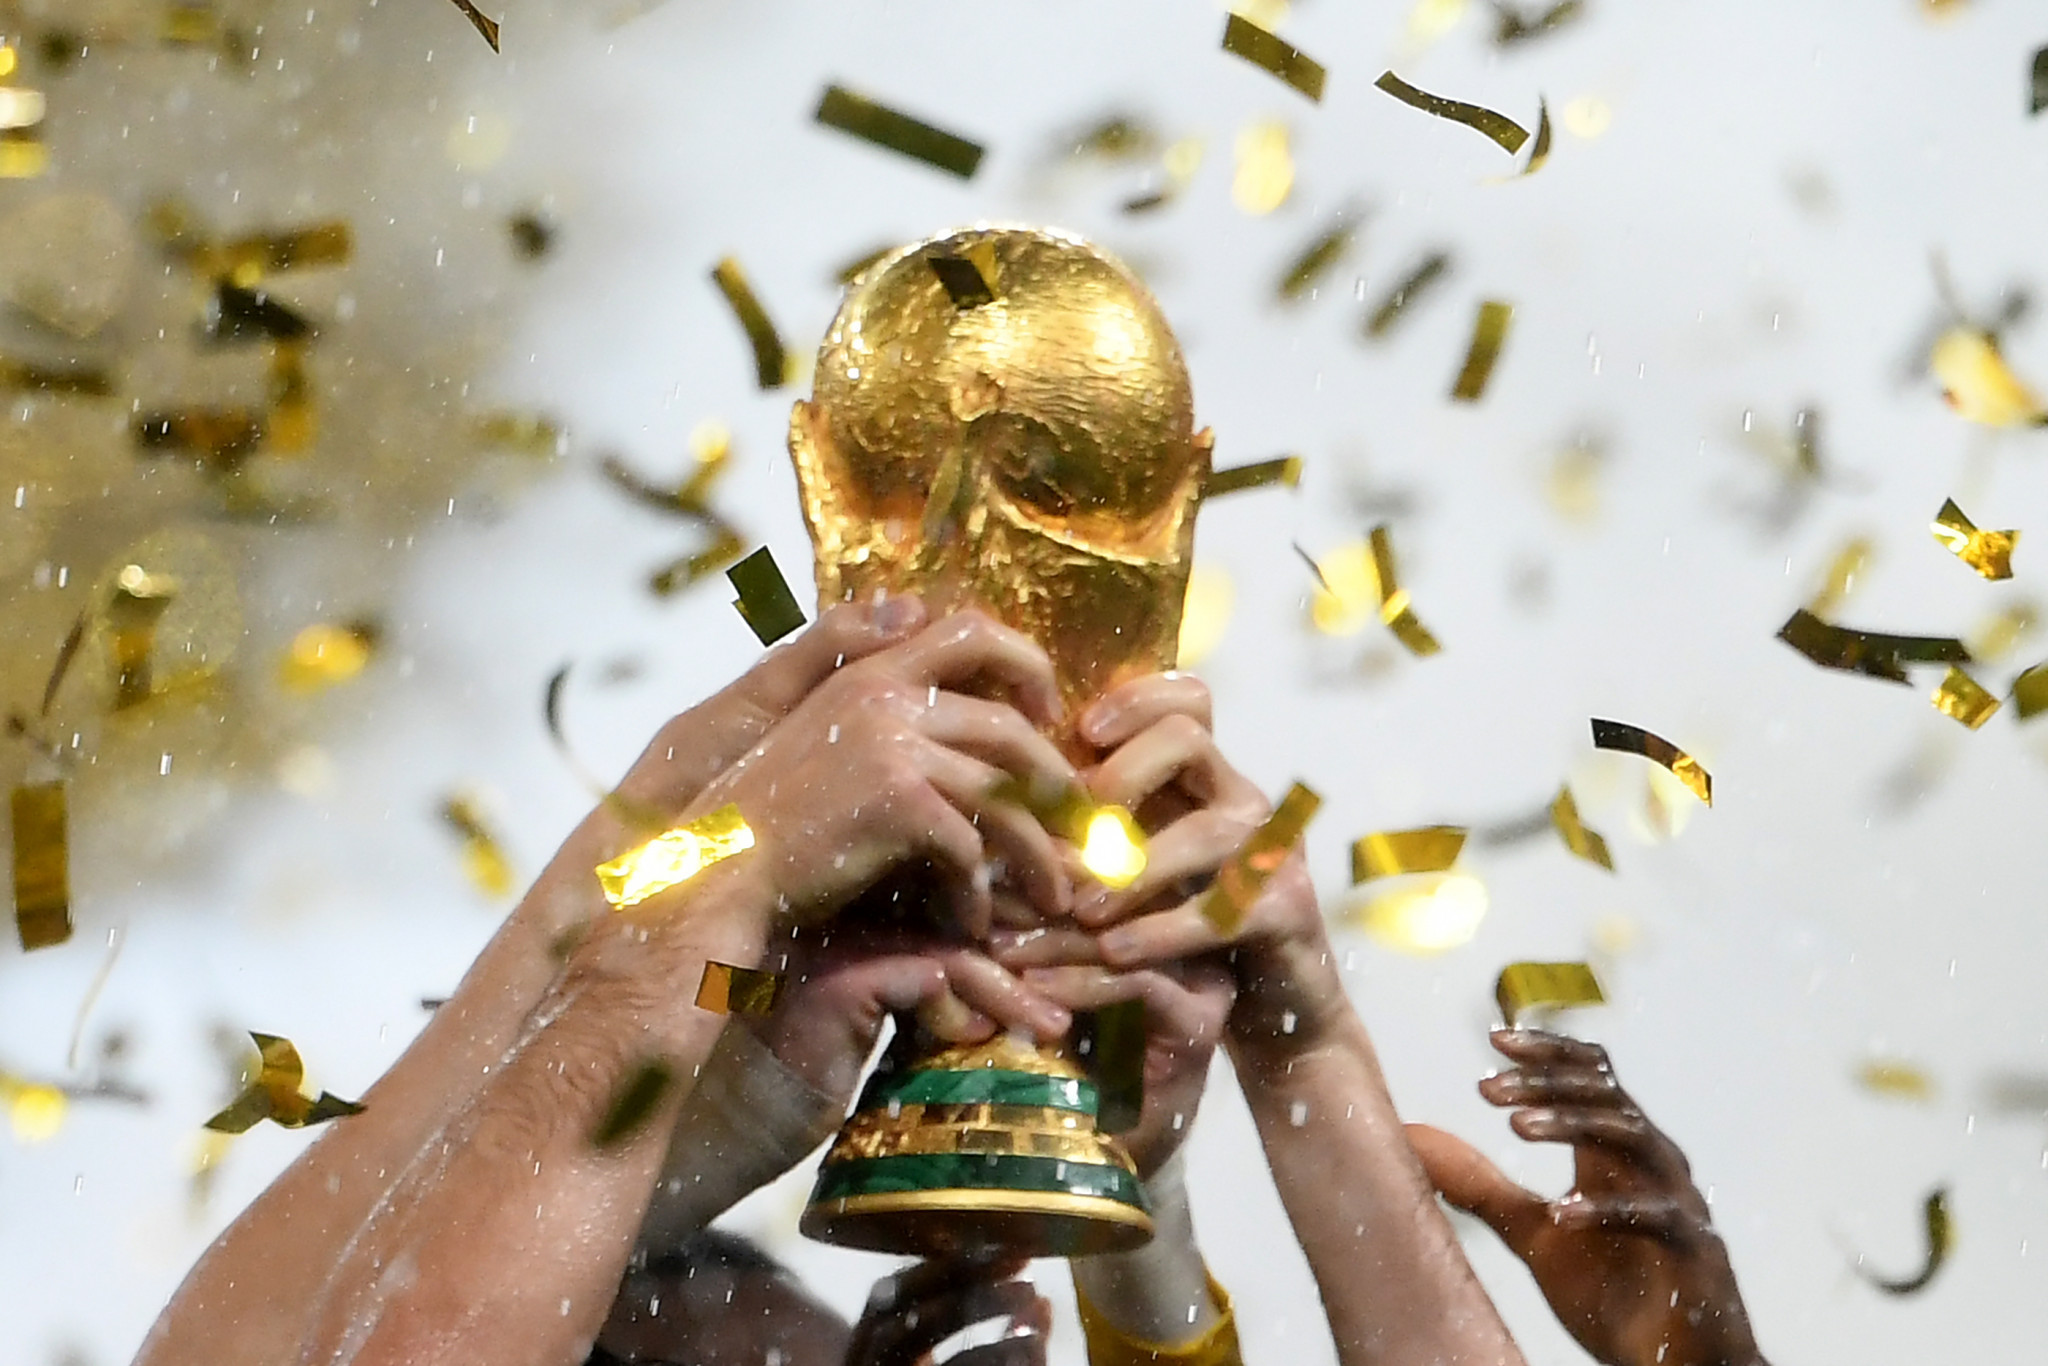 UK Sport outlines major event hosting ambitions as 10-year strategic plan published